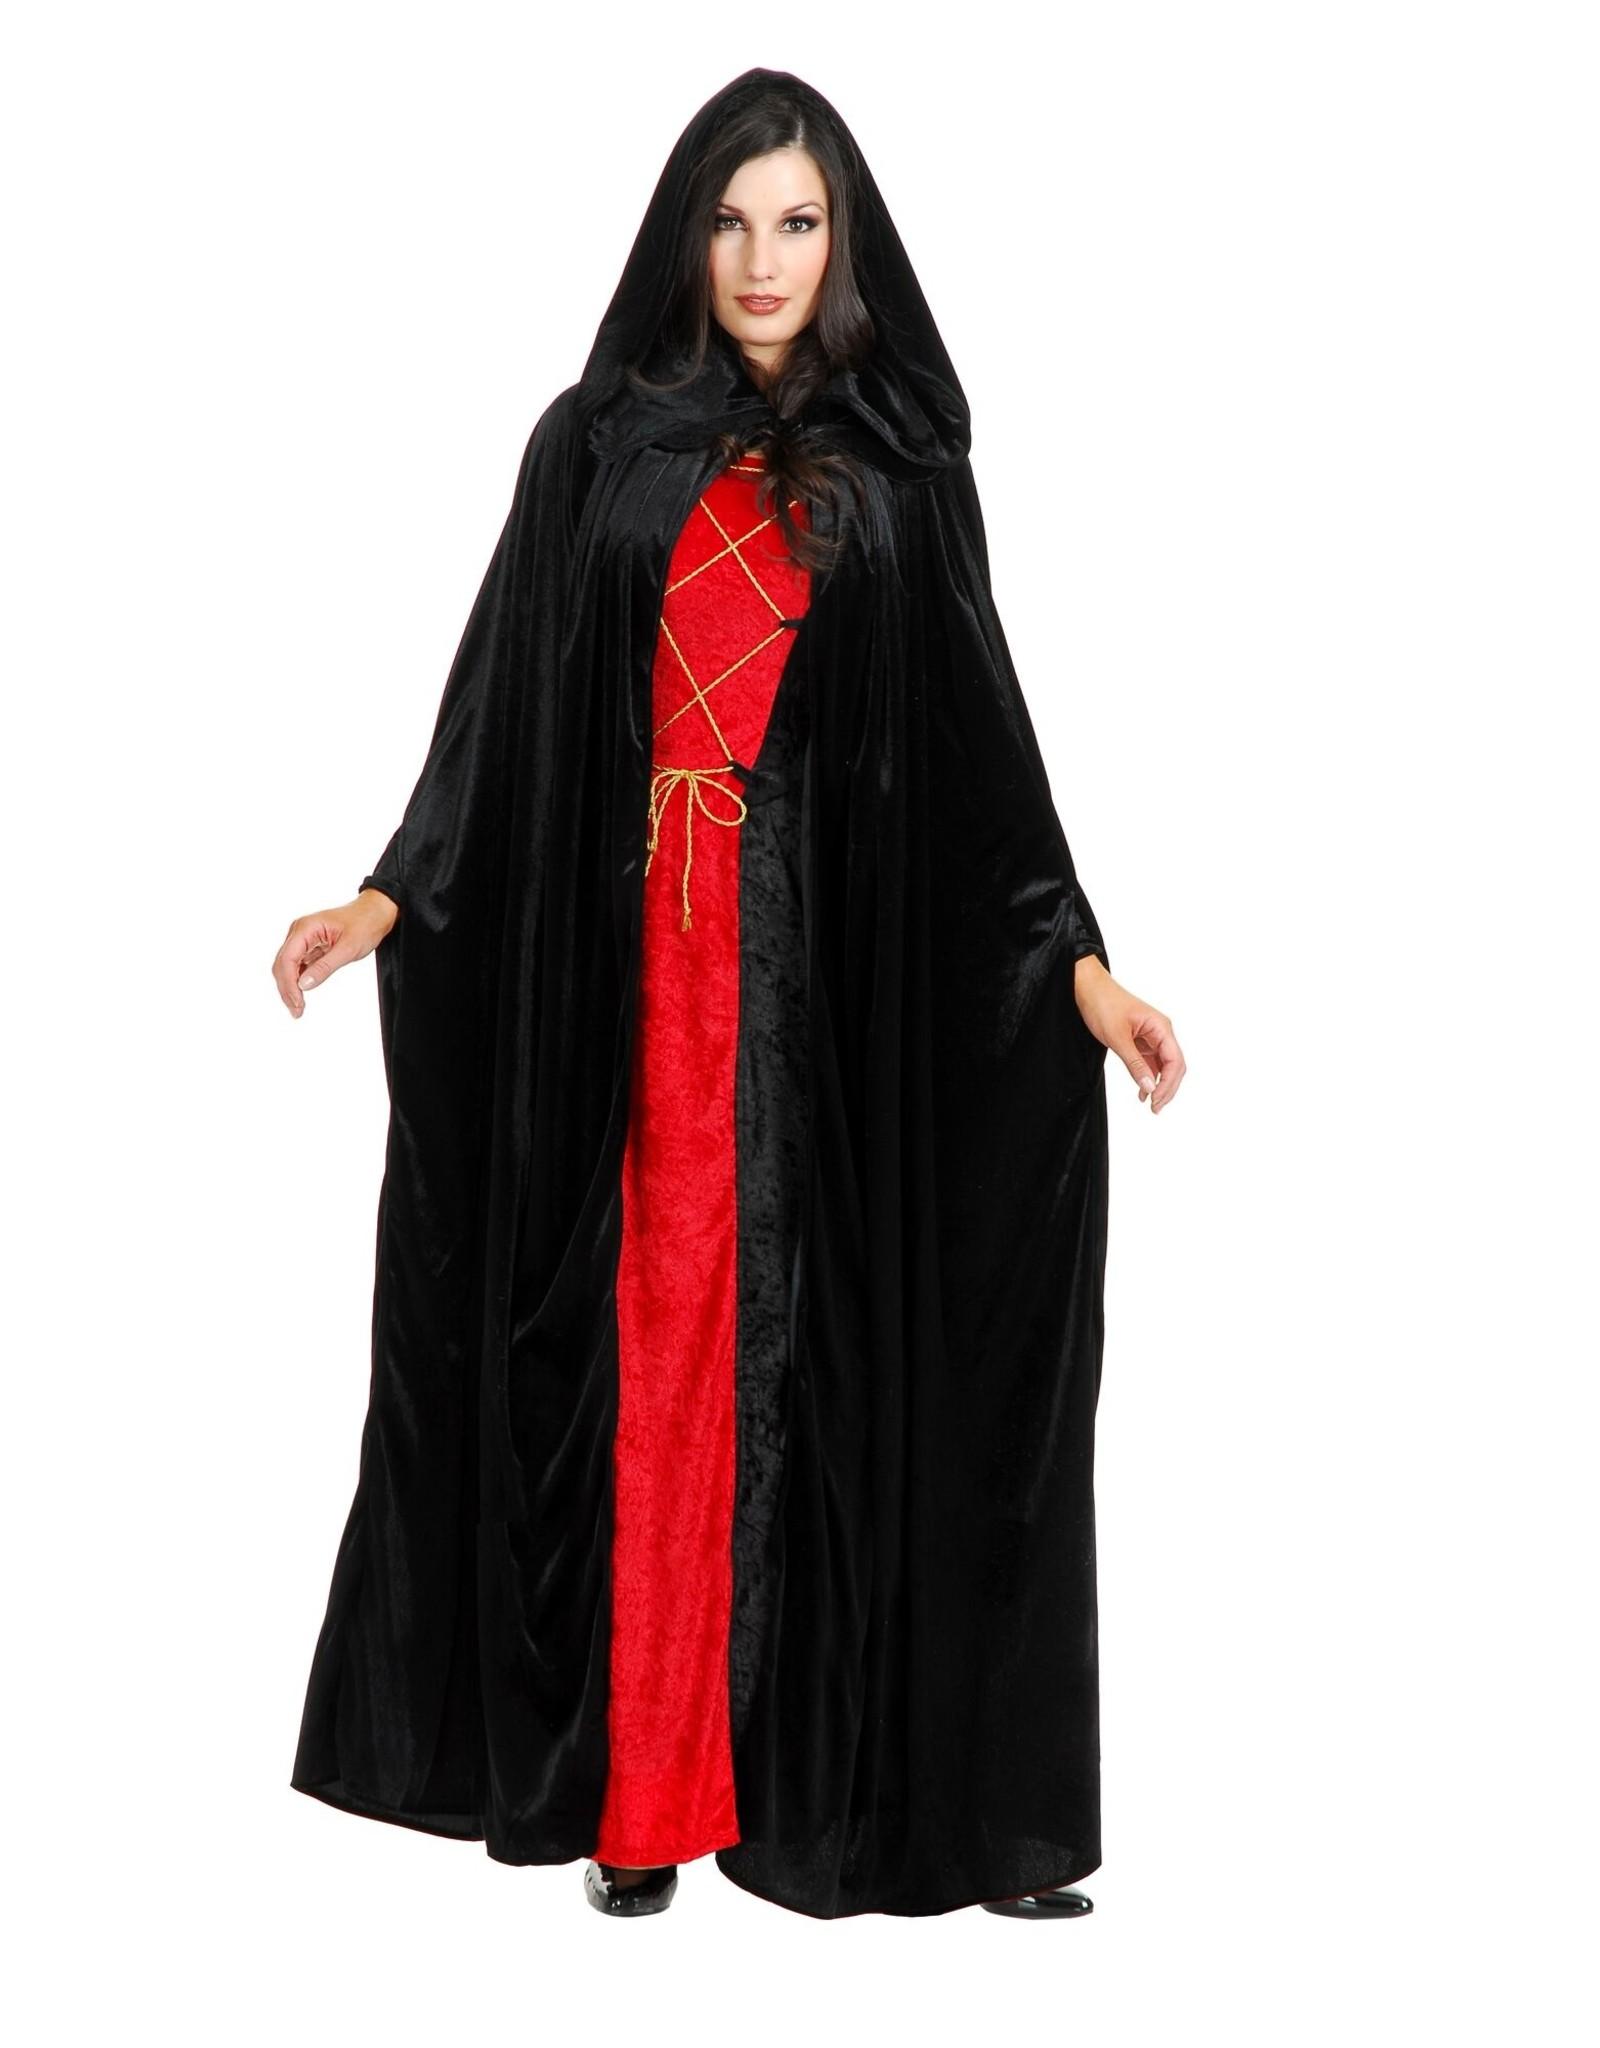 Charades Black Cloak